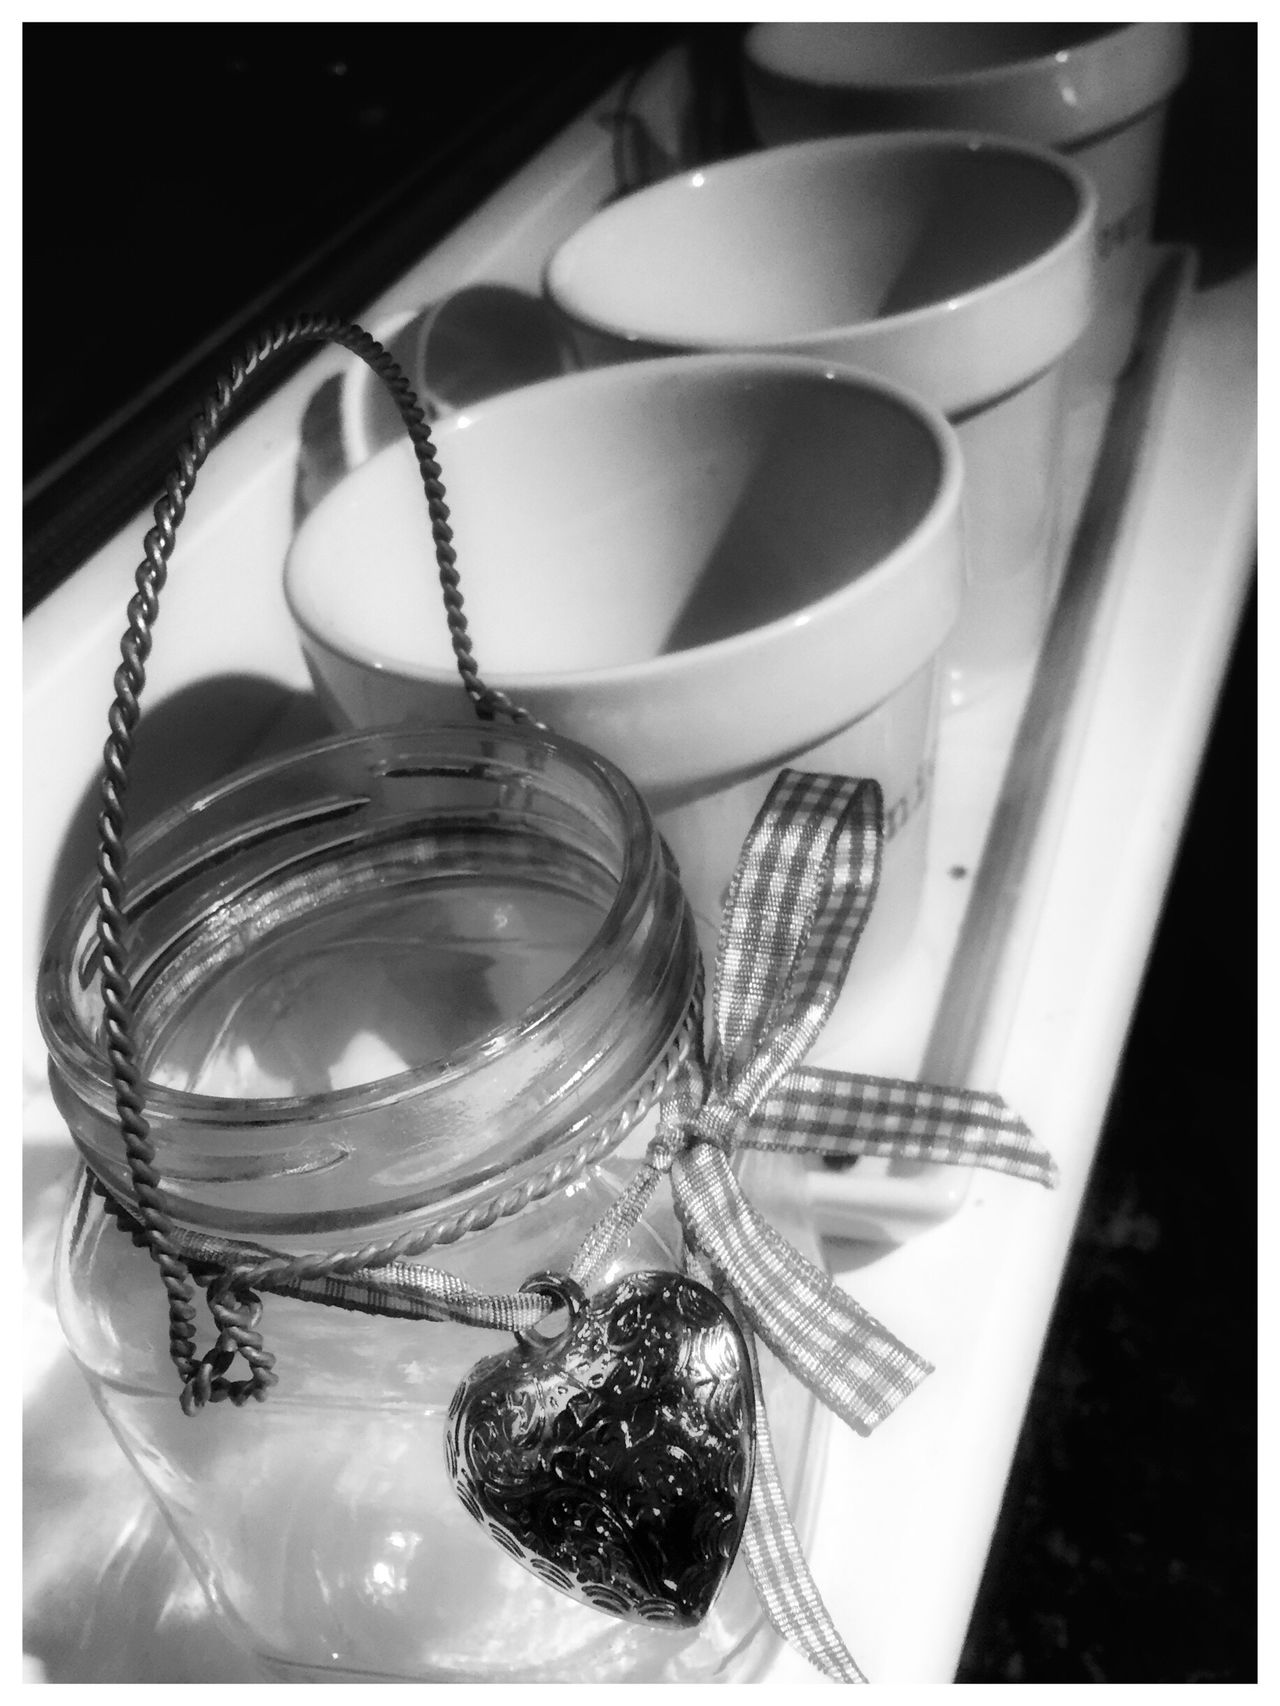 Jars  and Pots Close-up No People Indoors  Day Blackandwhite Monochrome EyeEm Gallery Kitchen Heart Heart Shape Glass EyeEmBestPics Eye4photography  EyeEm High Angle View Perspective Eye4photography